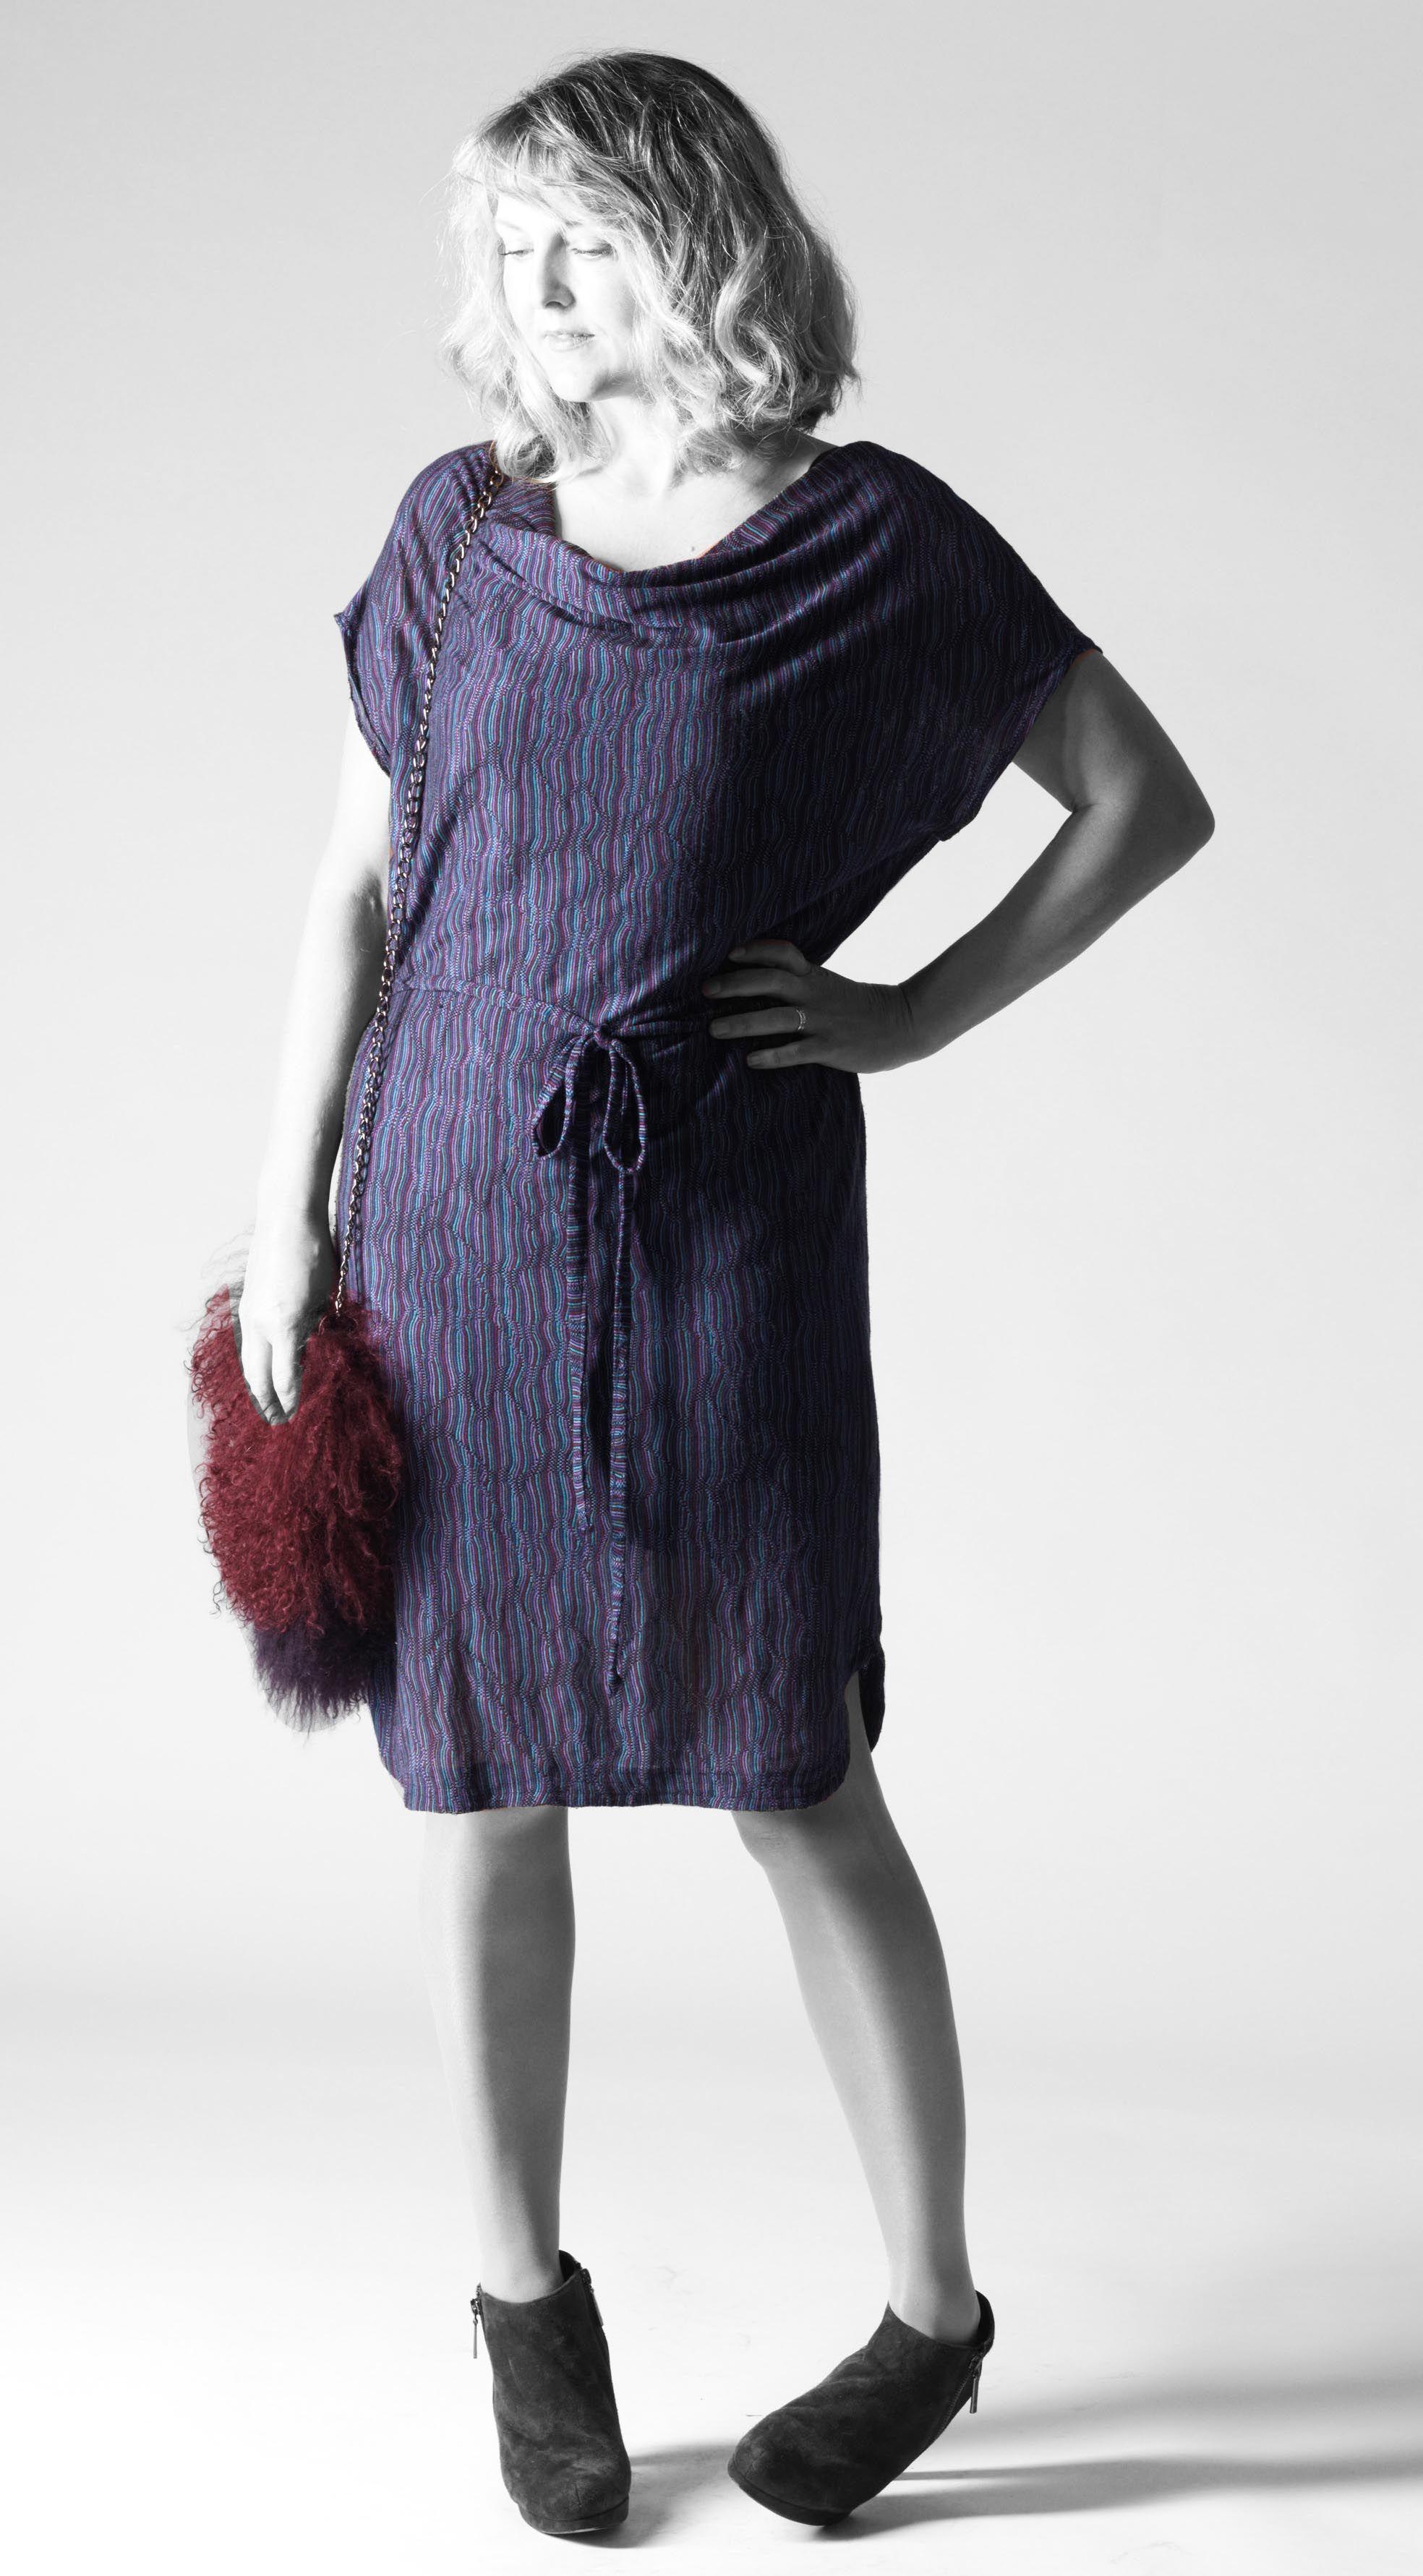 Parisienne dress free pattern lc001 easy dress free pattern parisienne dress free pattern lc001 jeuxipadfo Gallery